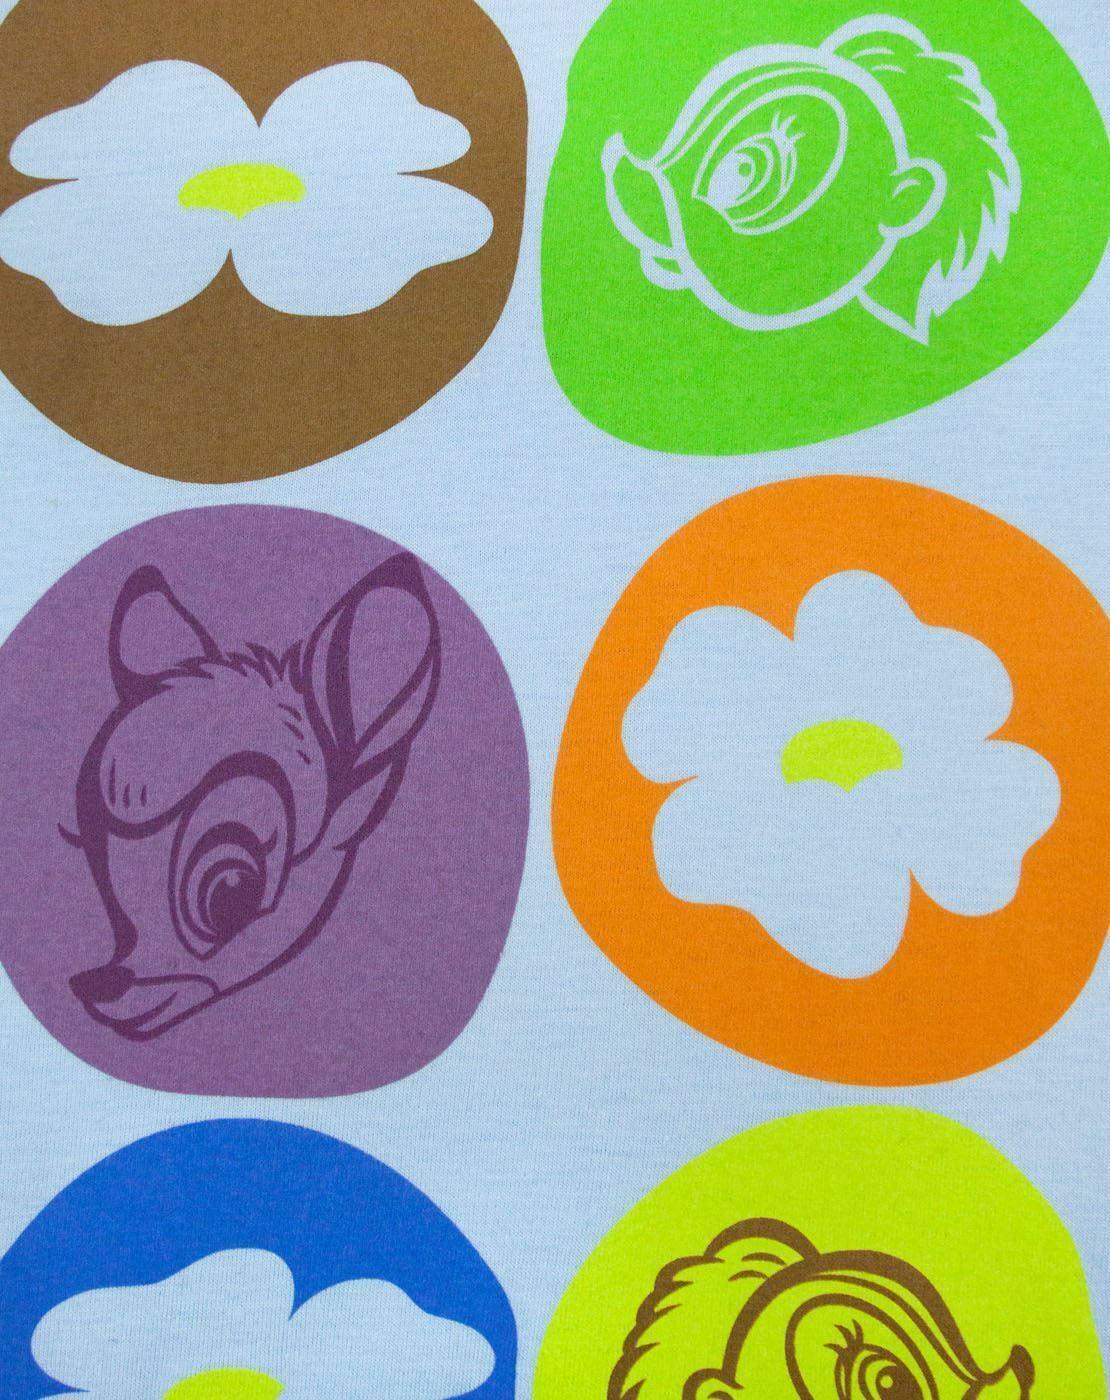 Disney-Bambi-Motif-Blue-Women-039-s-T-Shirt thumbnail 7